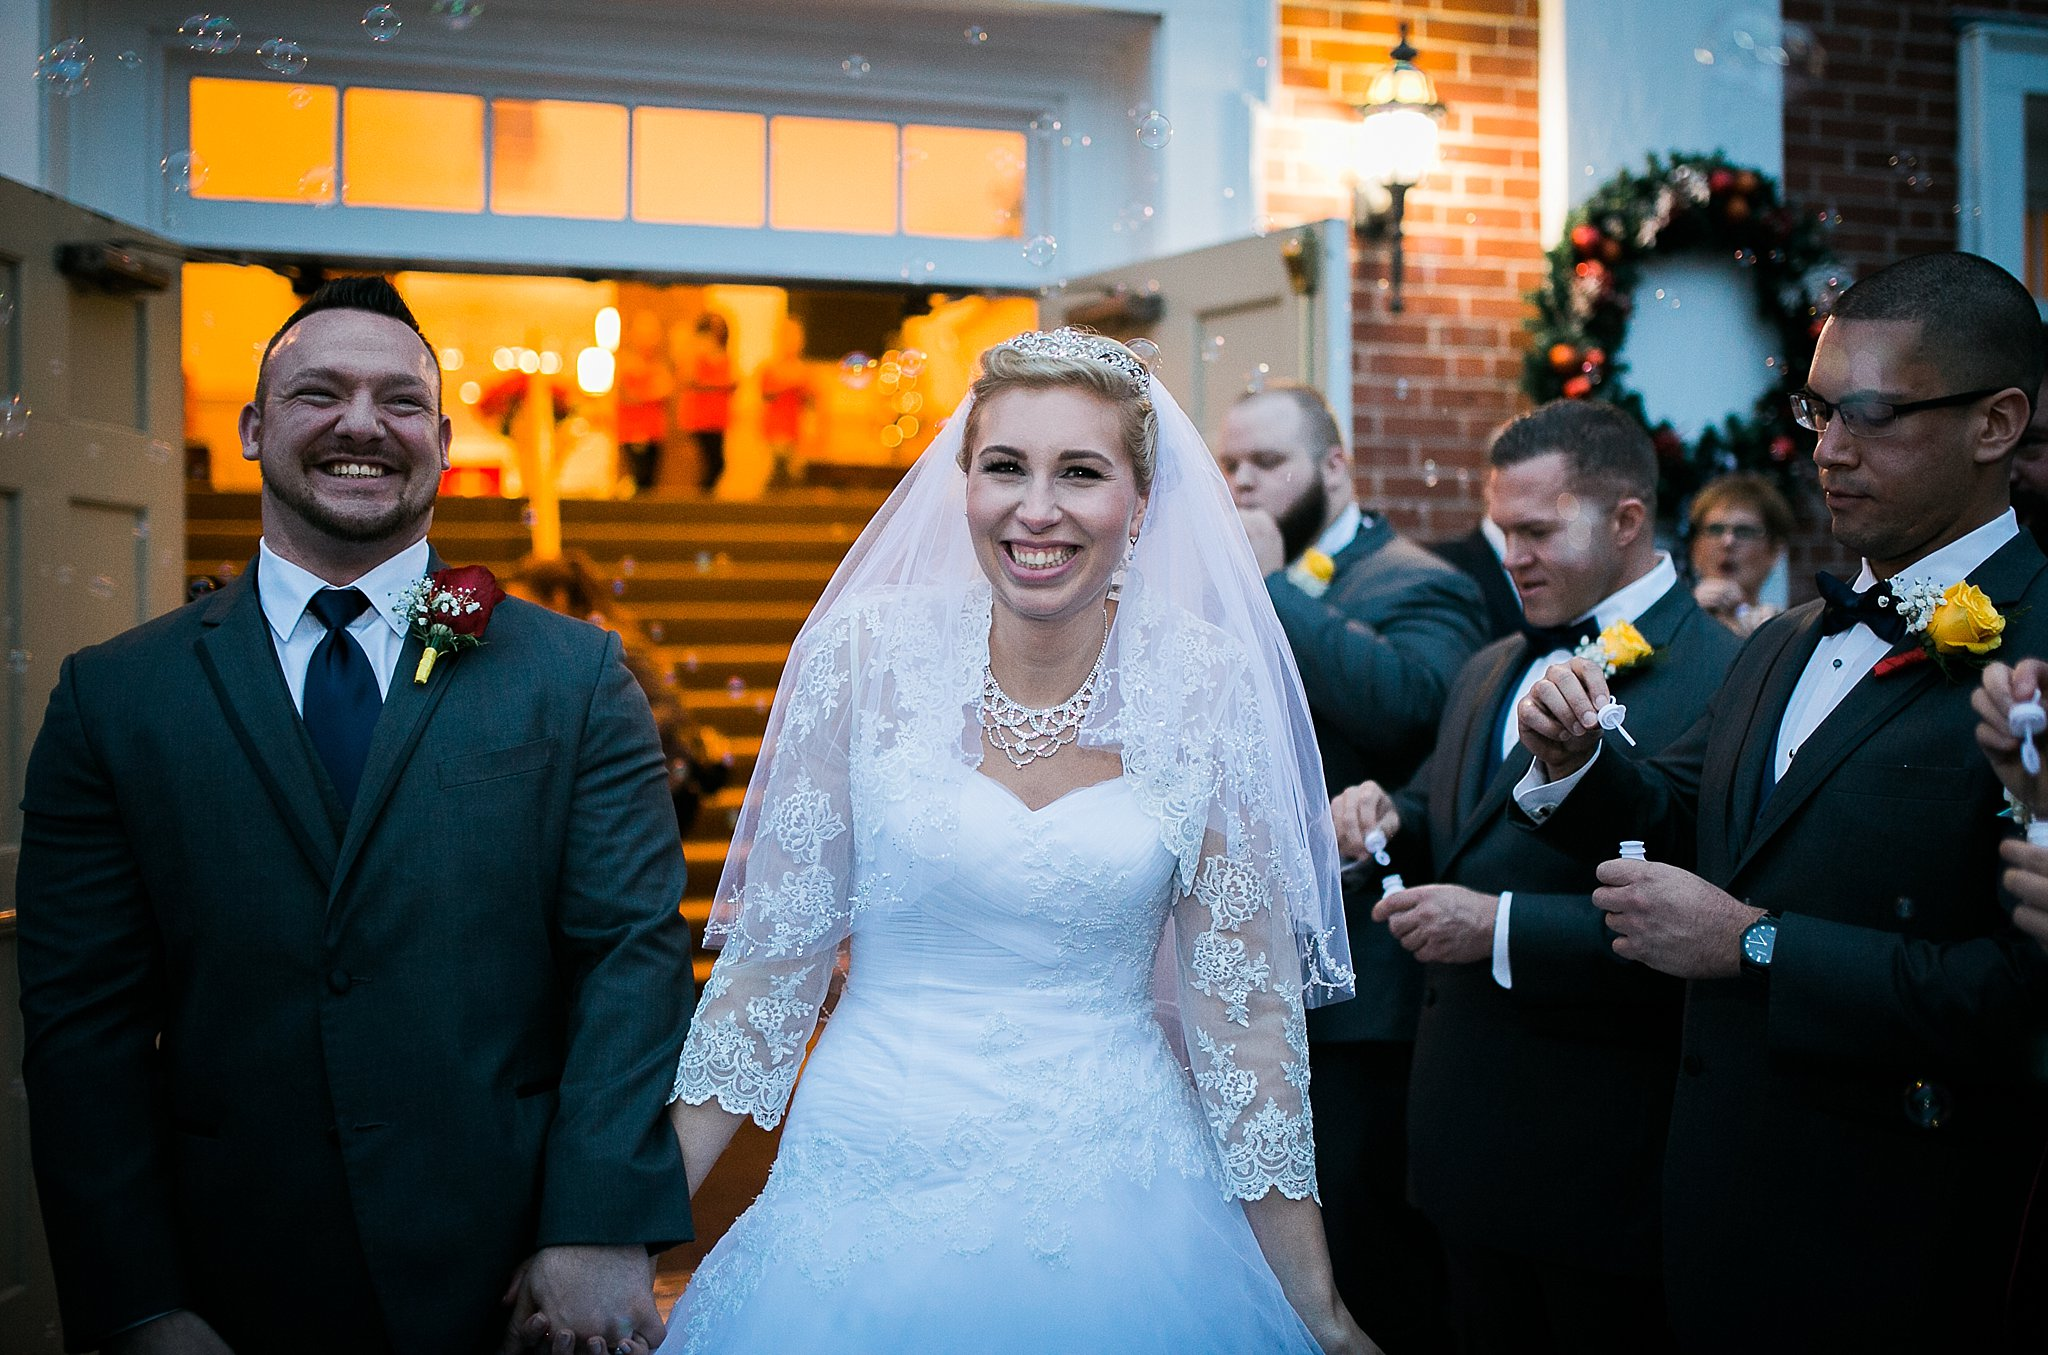 Wollaston Church of the Nazarene Wedding Boston Wedding Photographer28.jpg